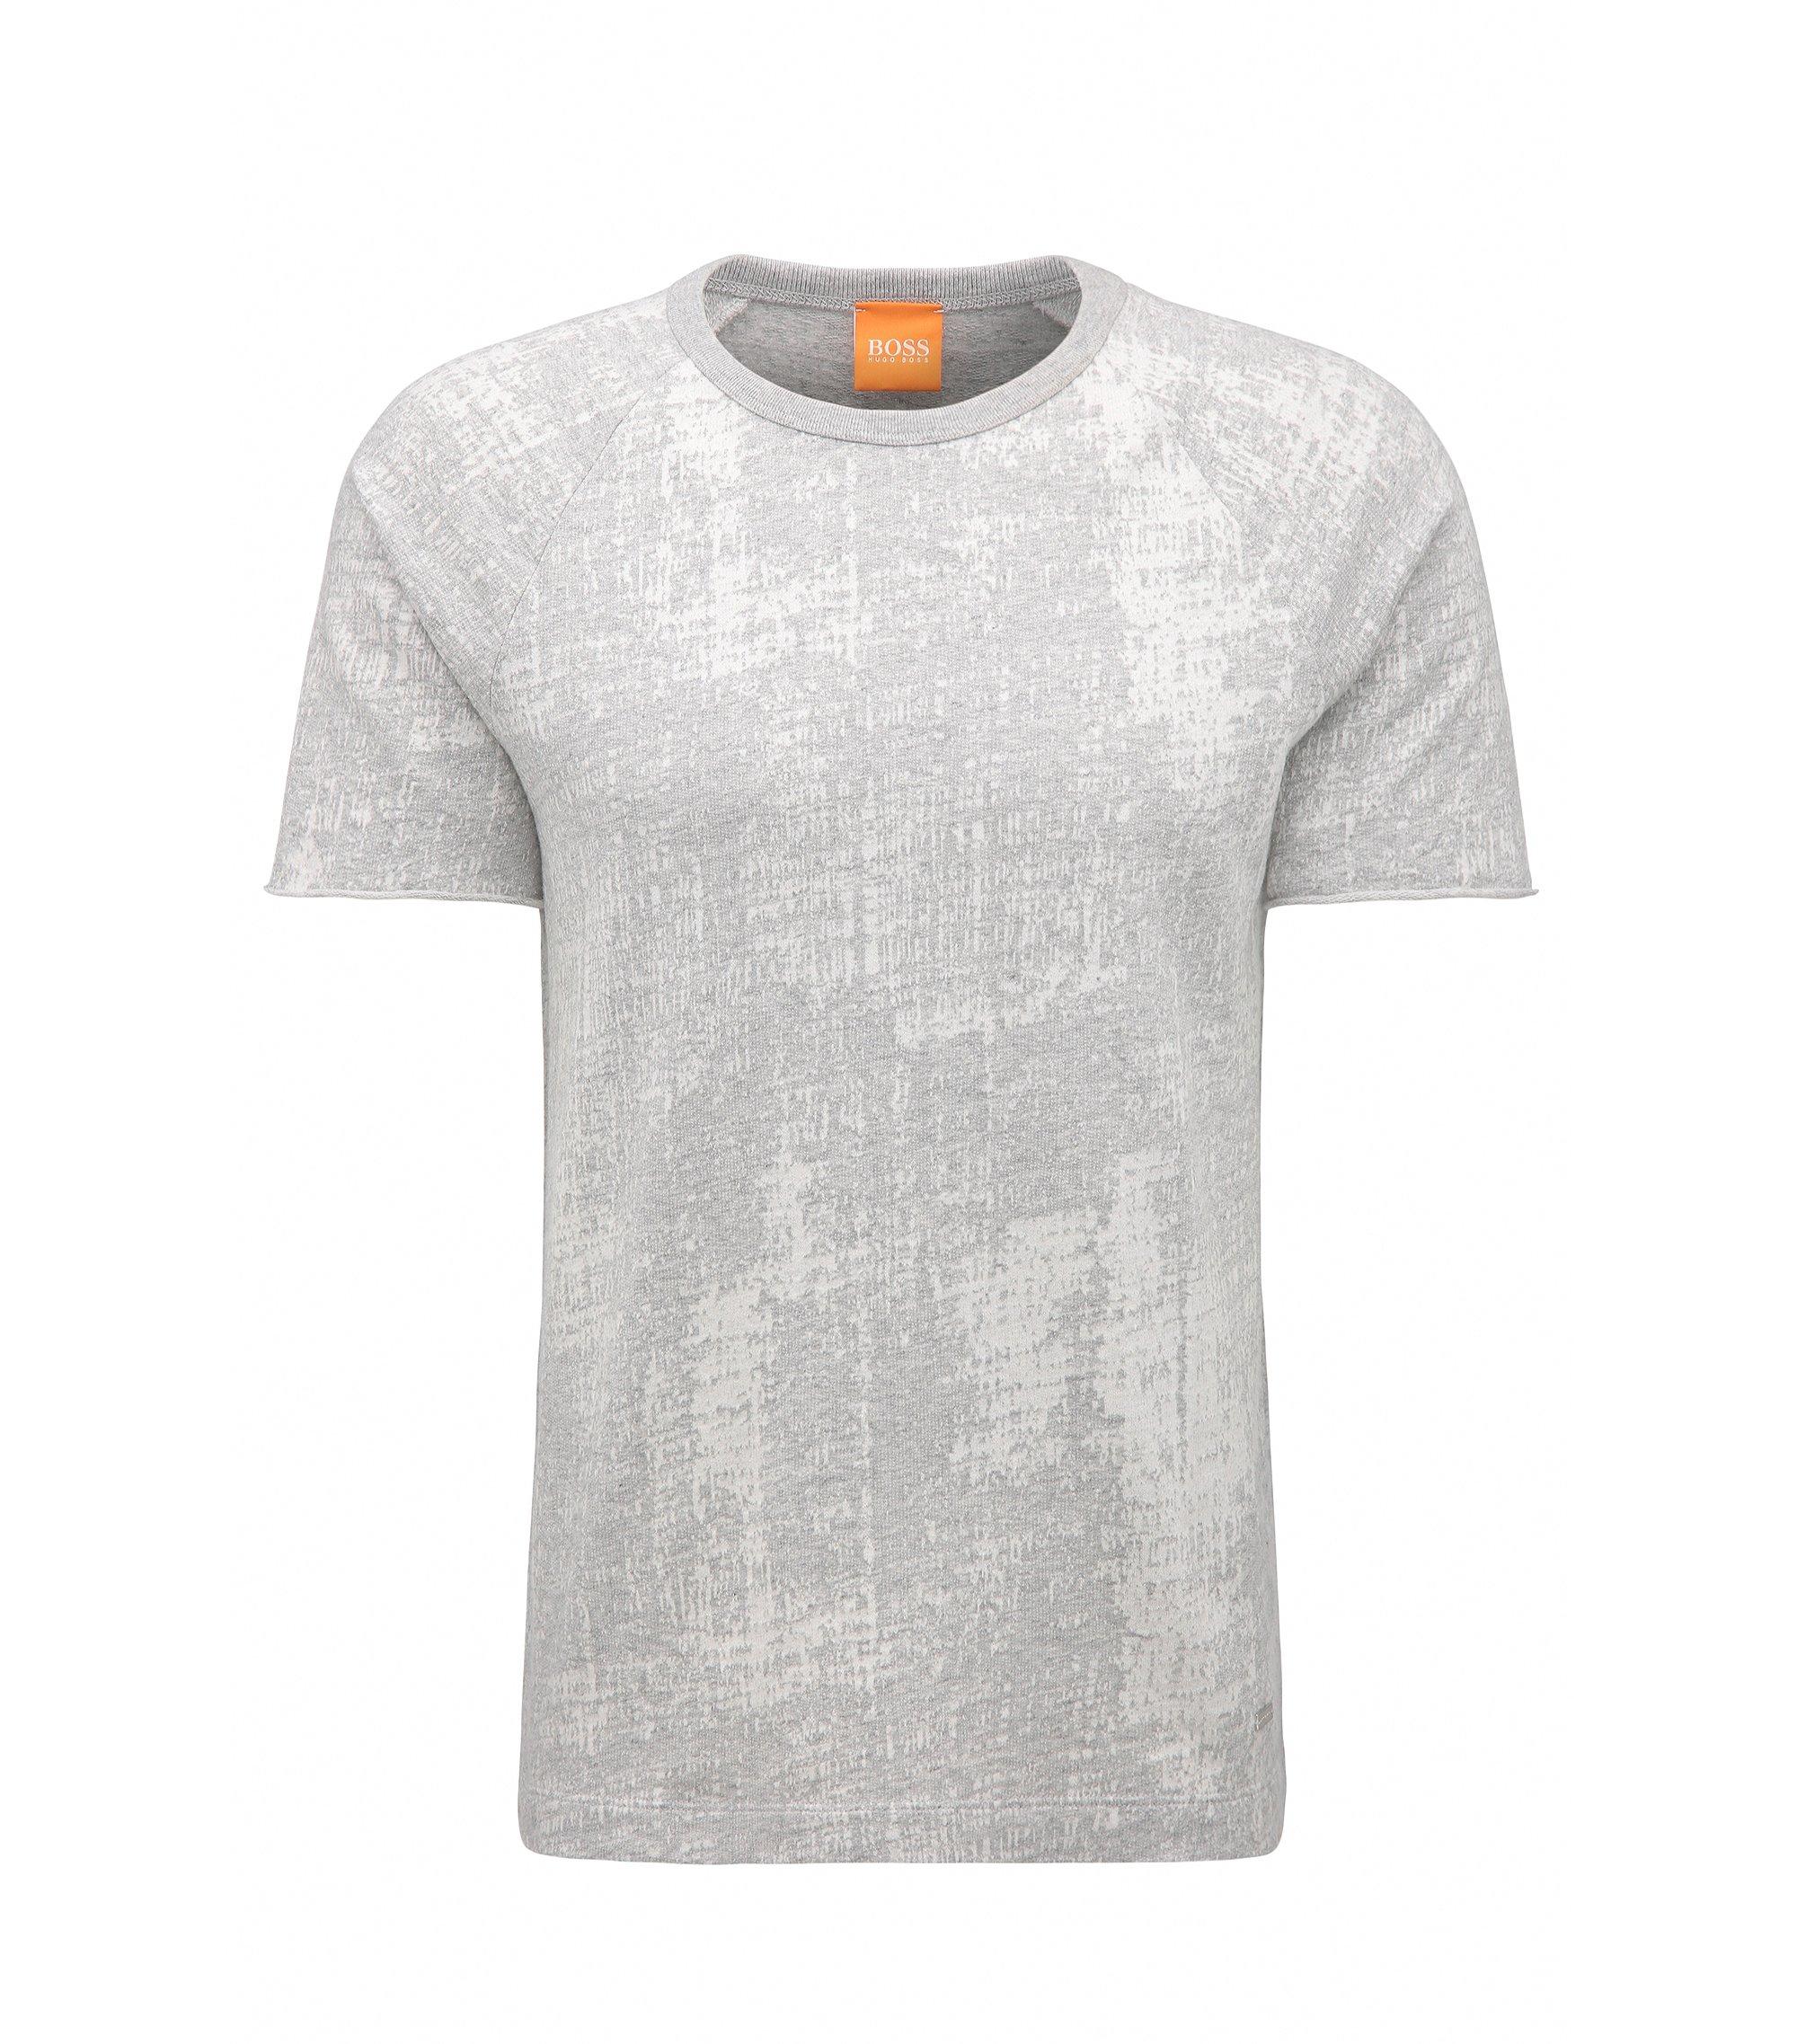 Relaxed-Fit T-Shirt aus Baumwoll-Jacquard, Hellgrau